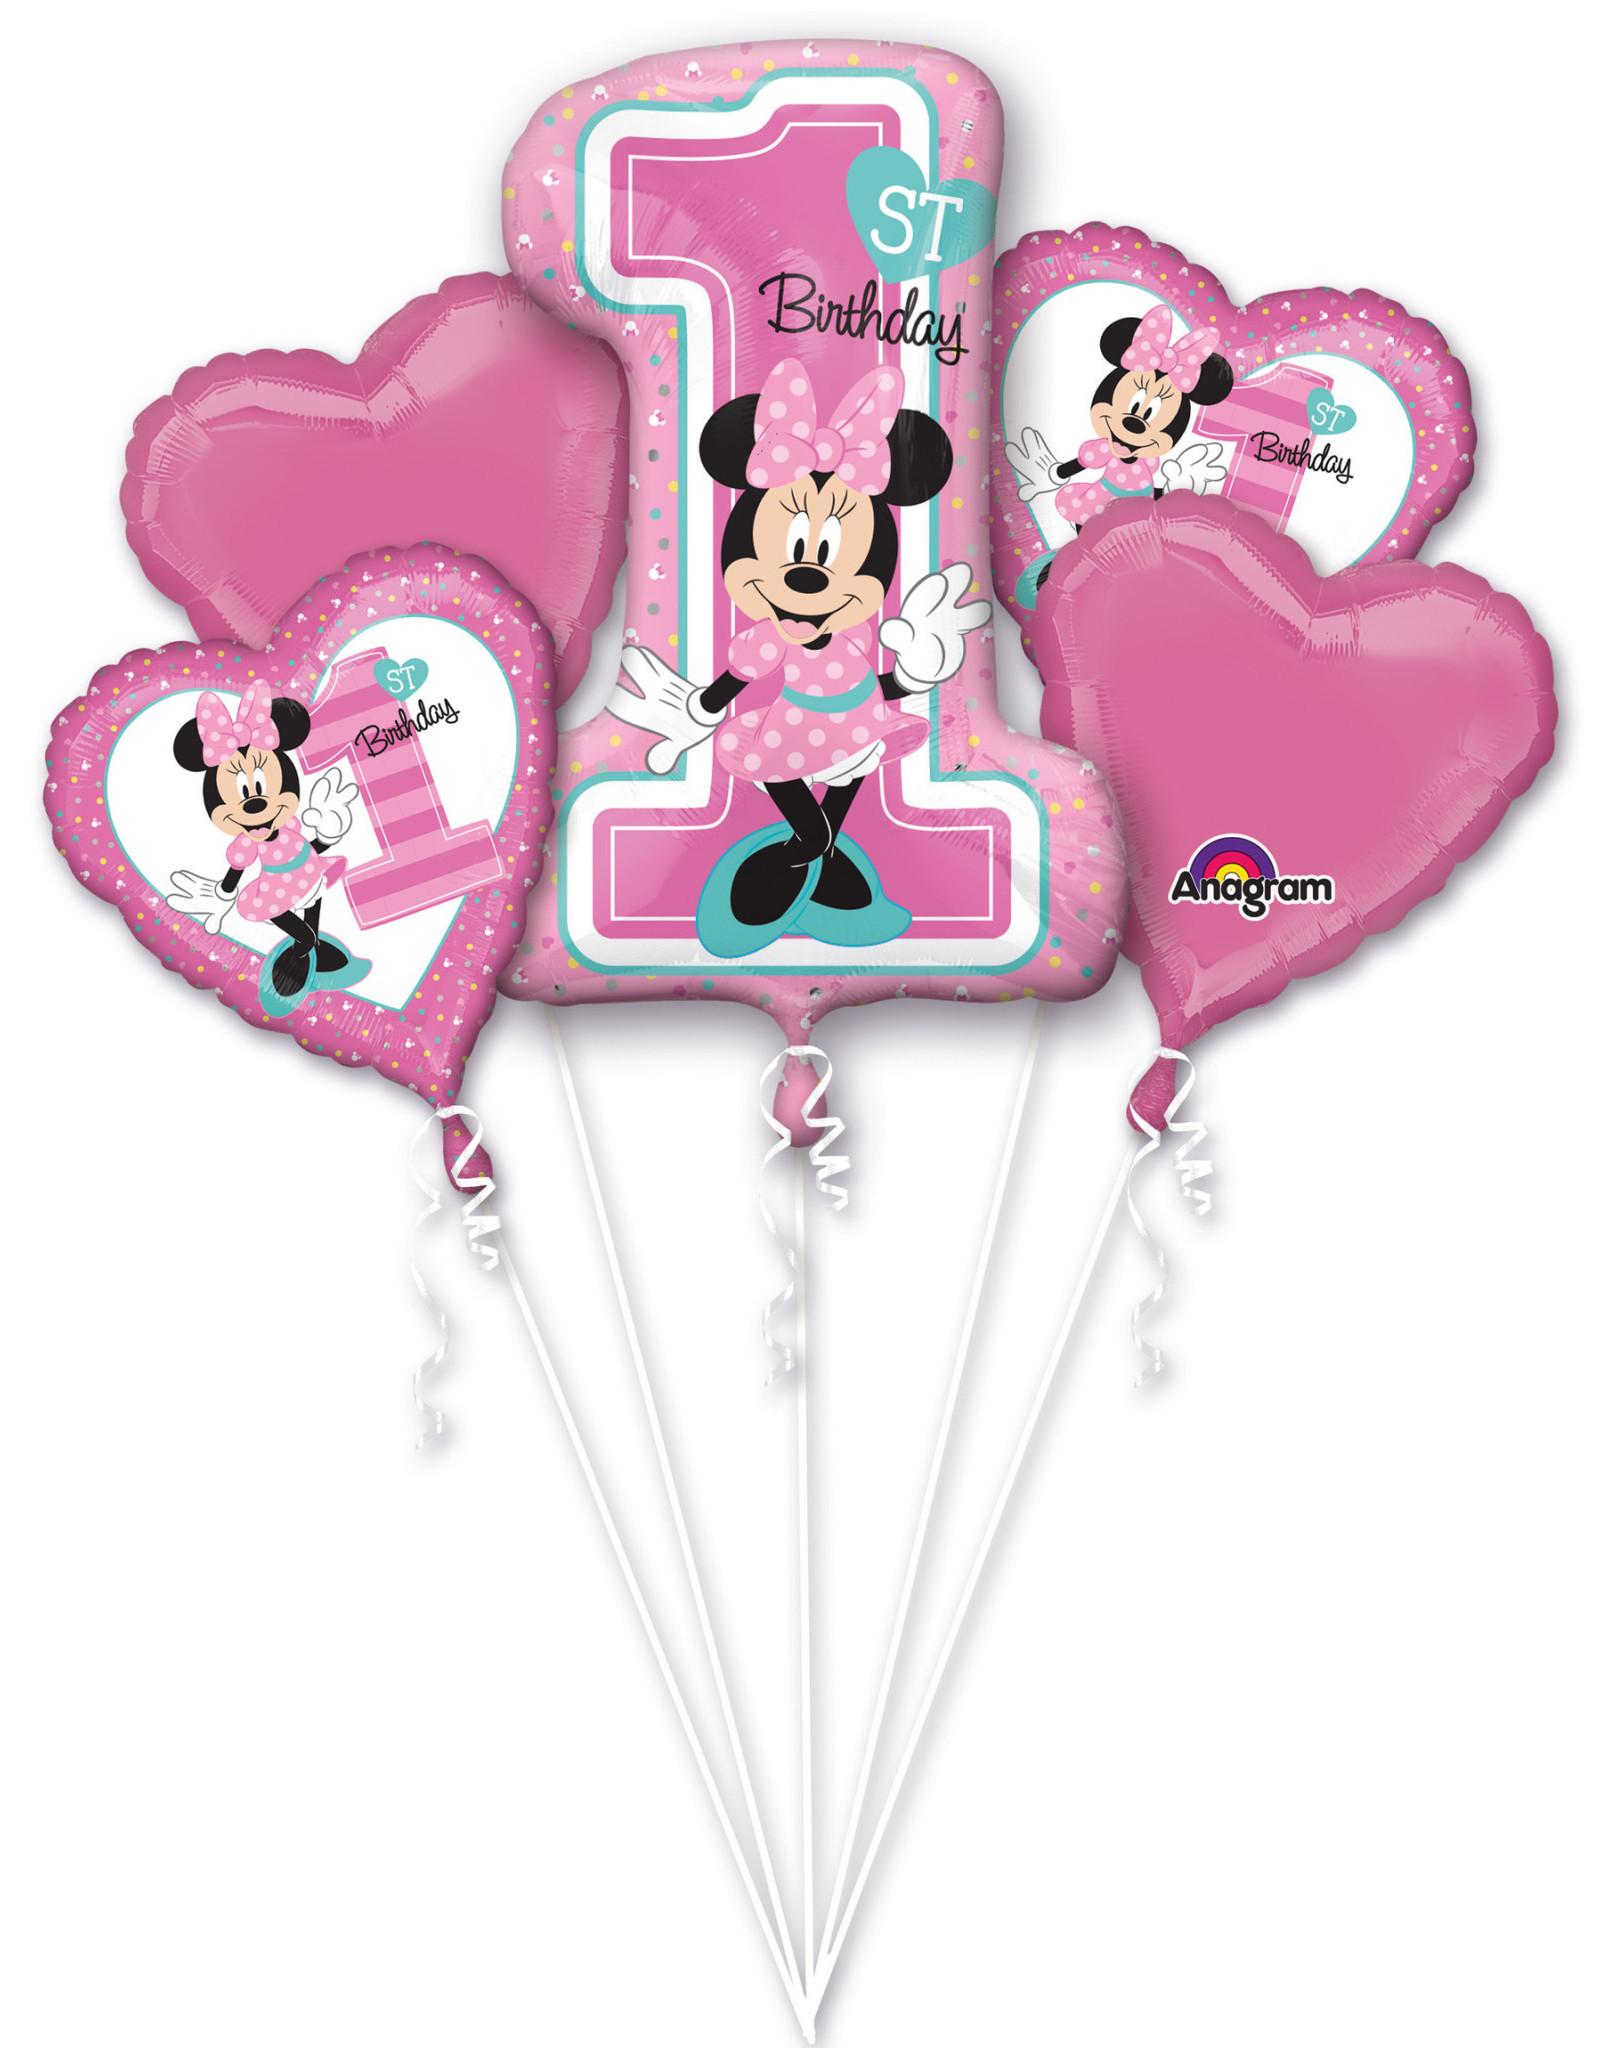 Amscan folieballonpakket 1st birthday Minnie Mouse 5-delig